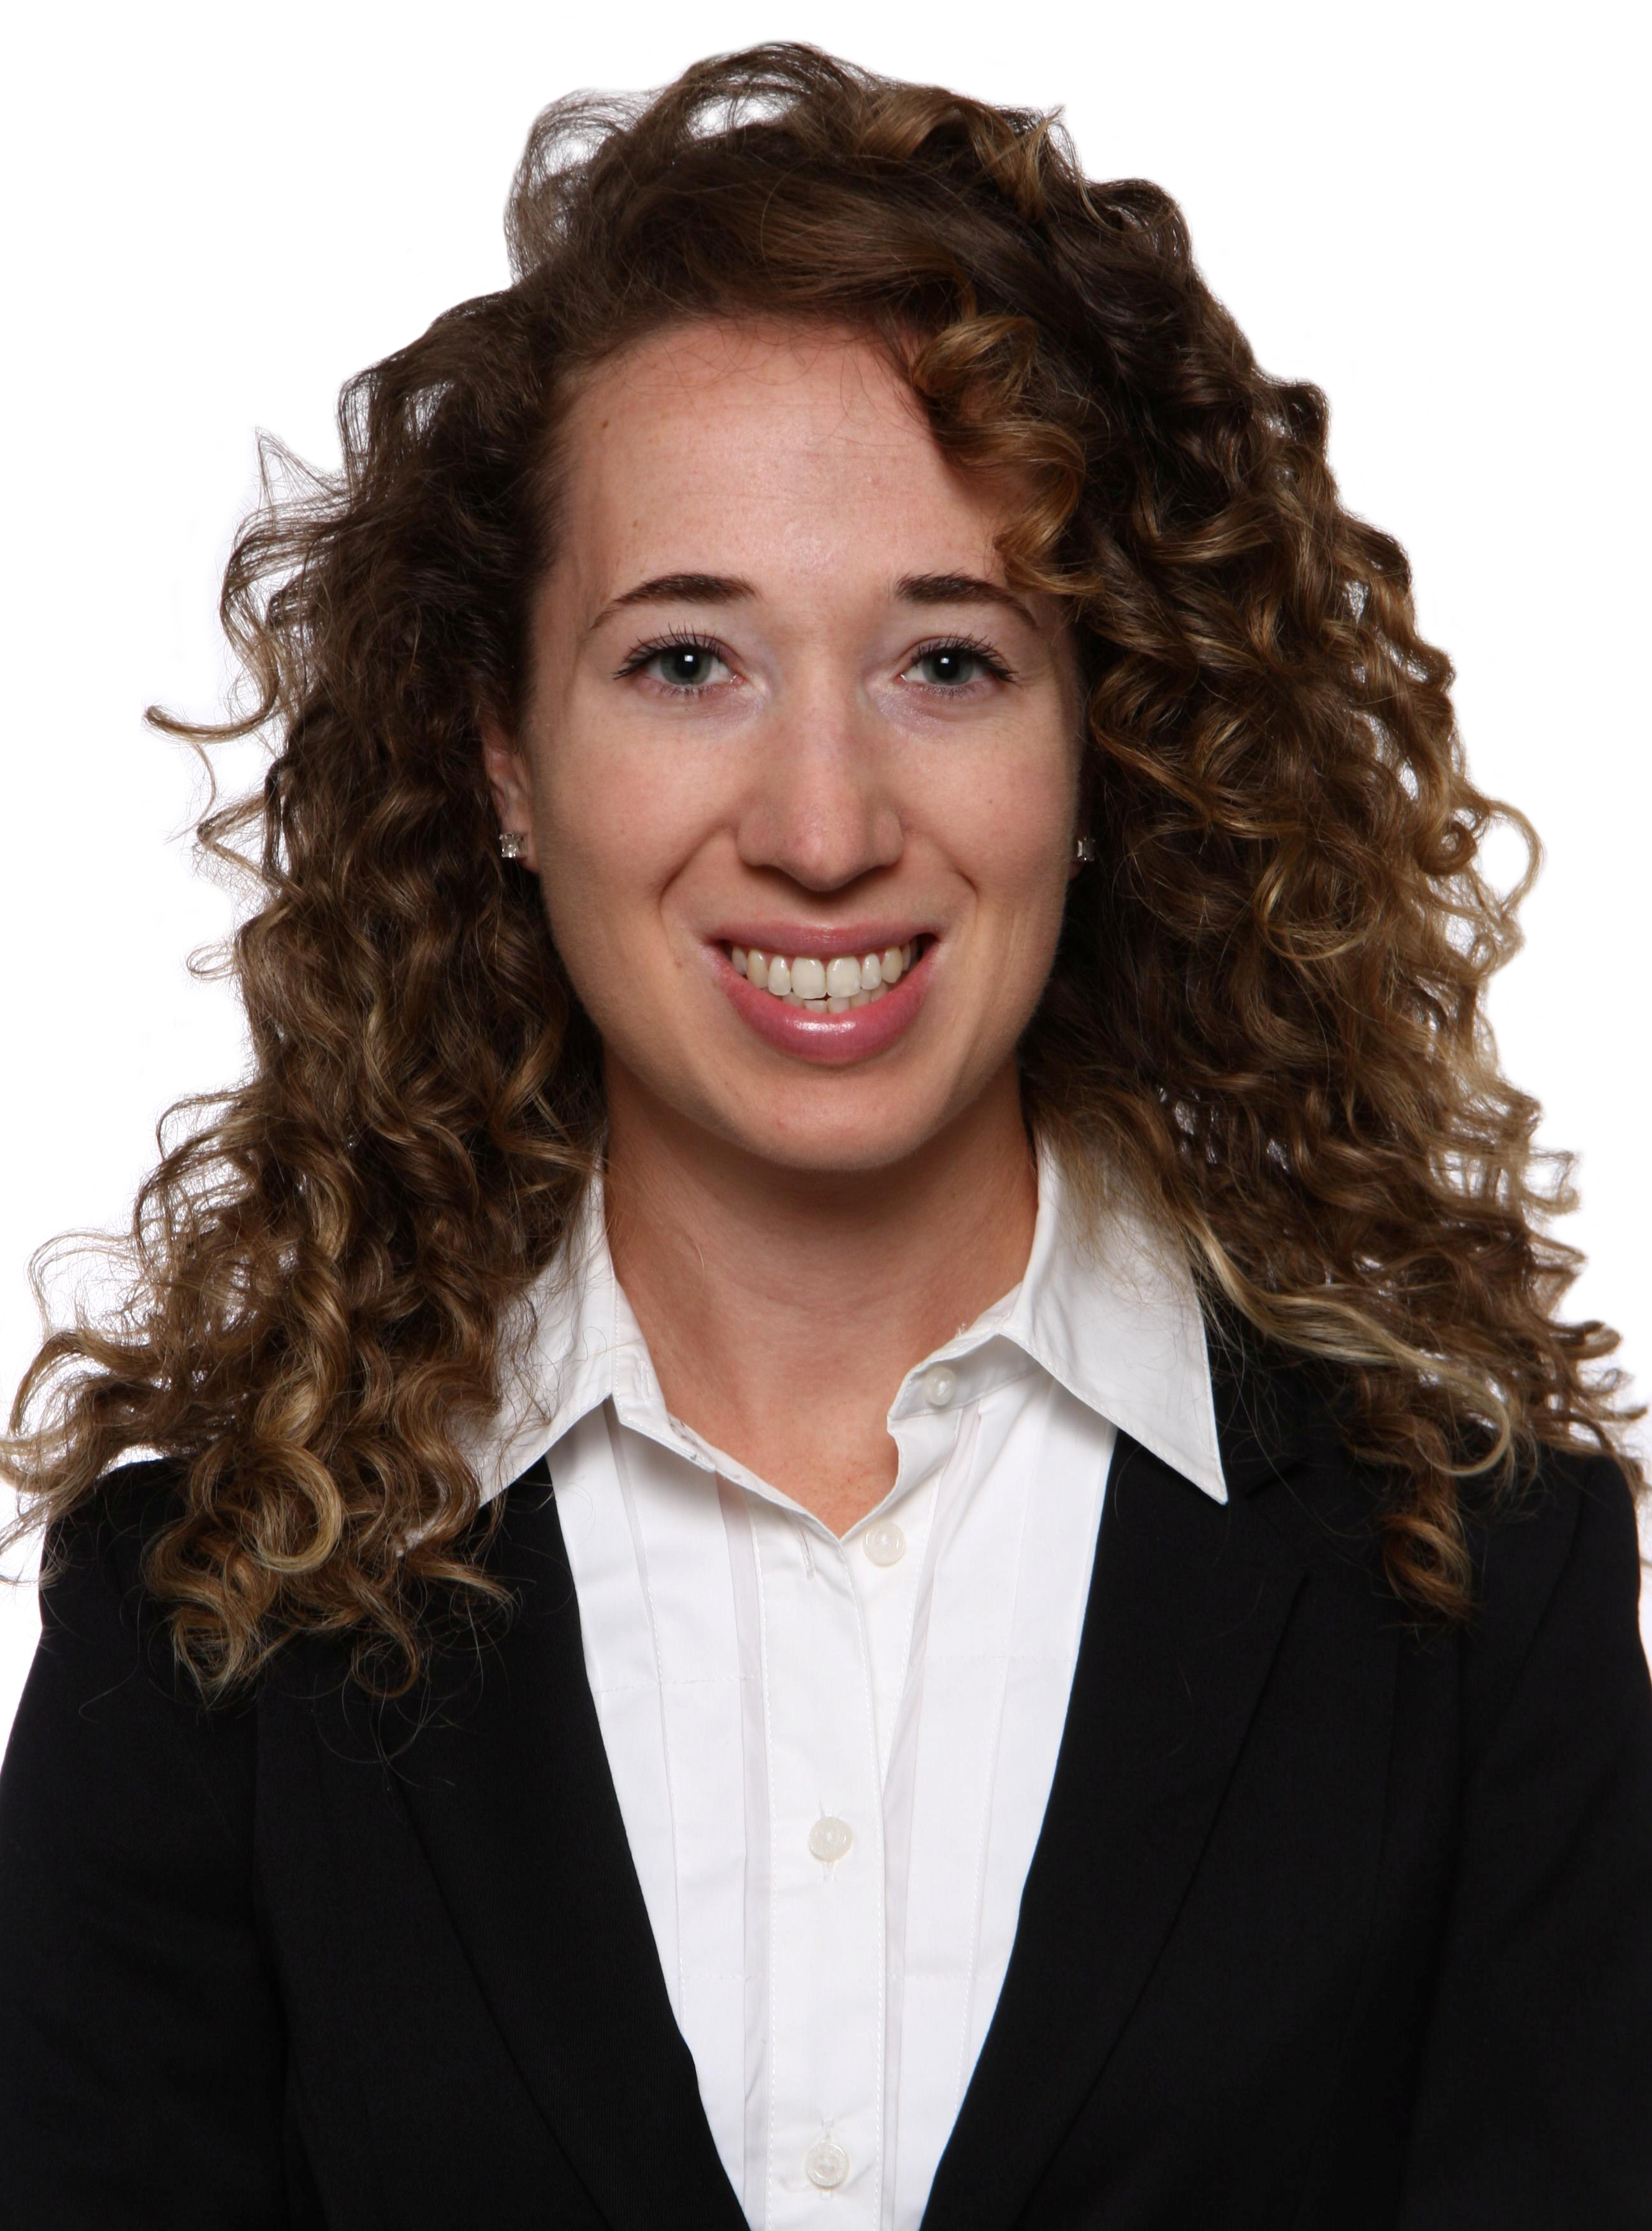 Kristan - Ergonomic, Health and Wellness Consultant